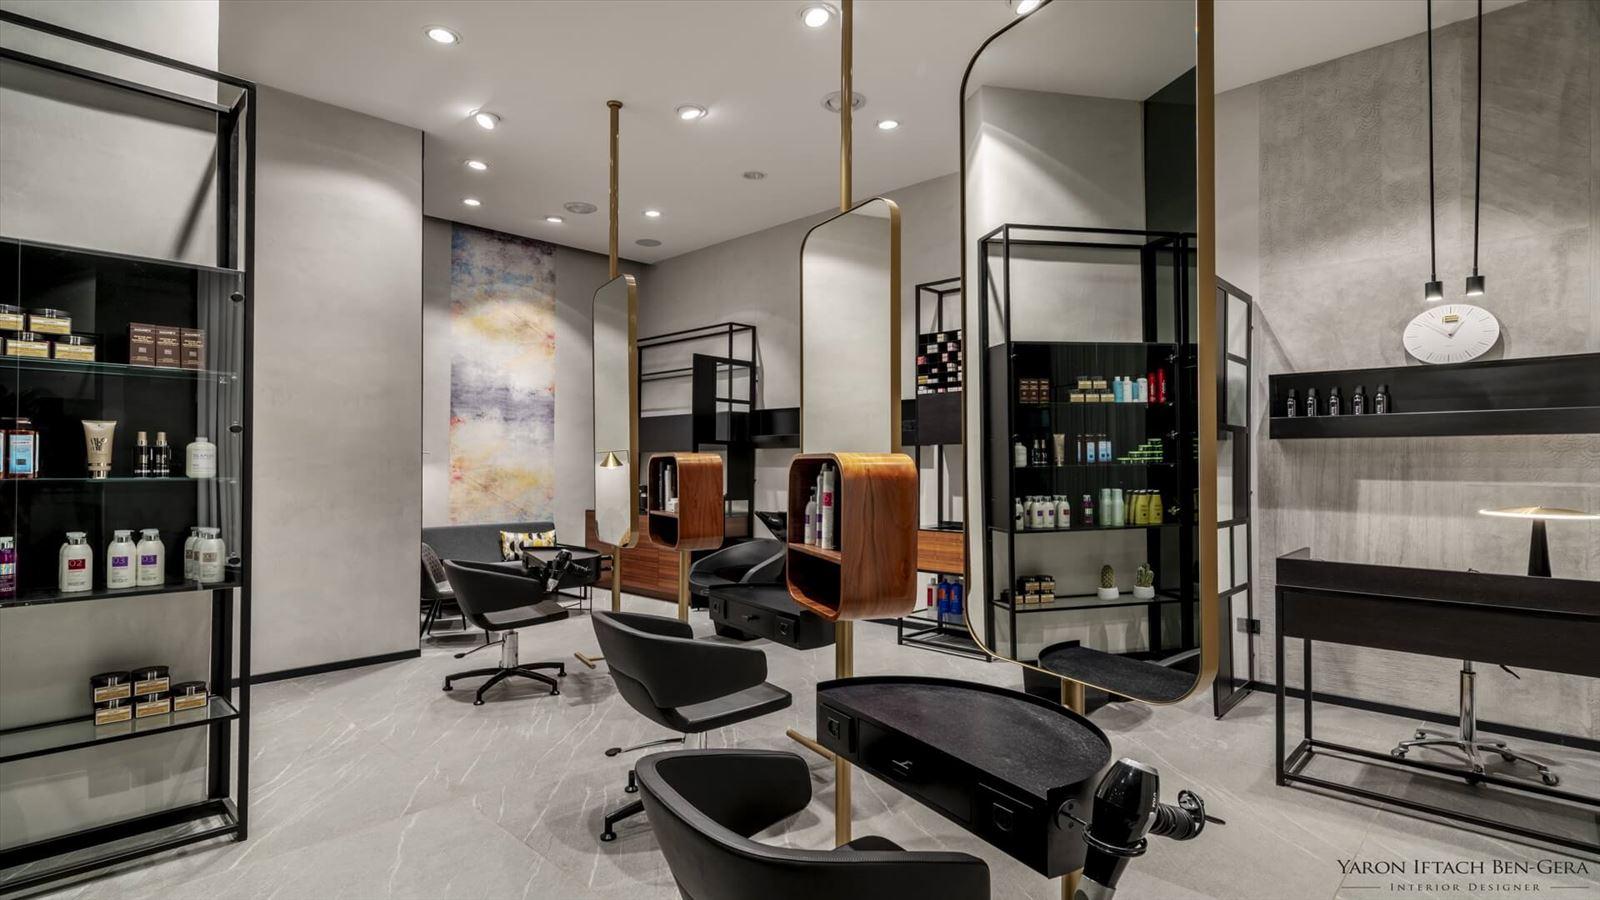 Boutique Hair Dressing Salon עיצוב תאורת המספרה על ידי קמחי דורי